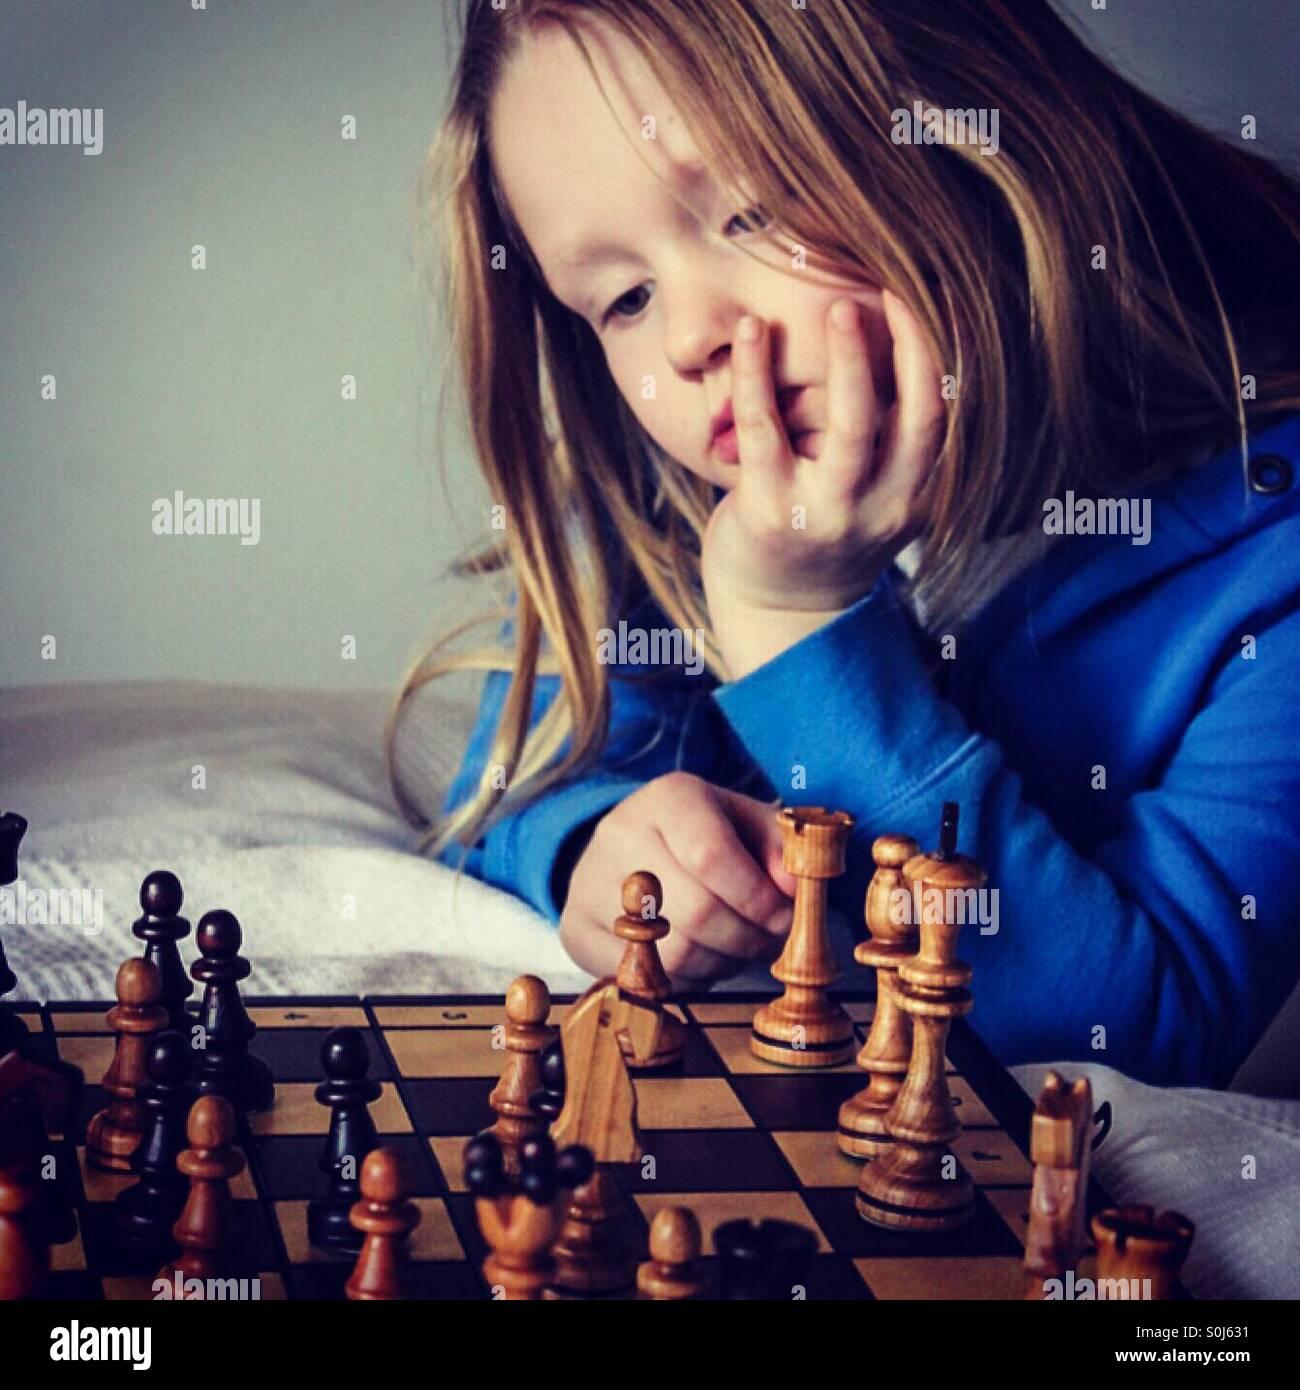 Girl playing chess Photo Stock